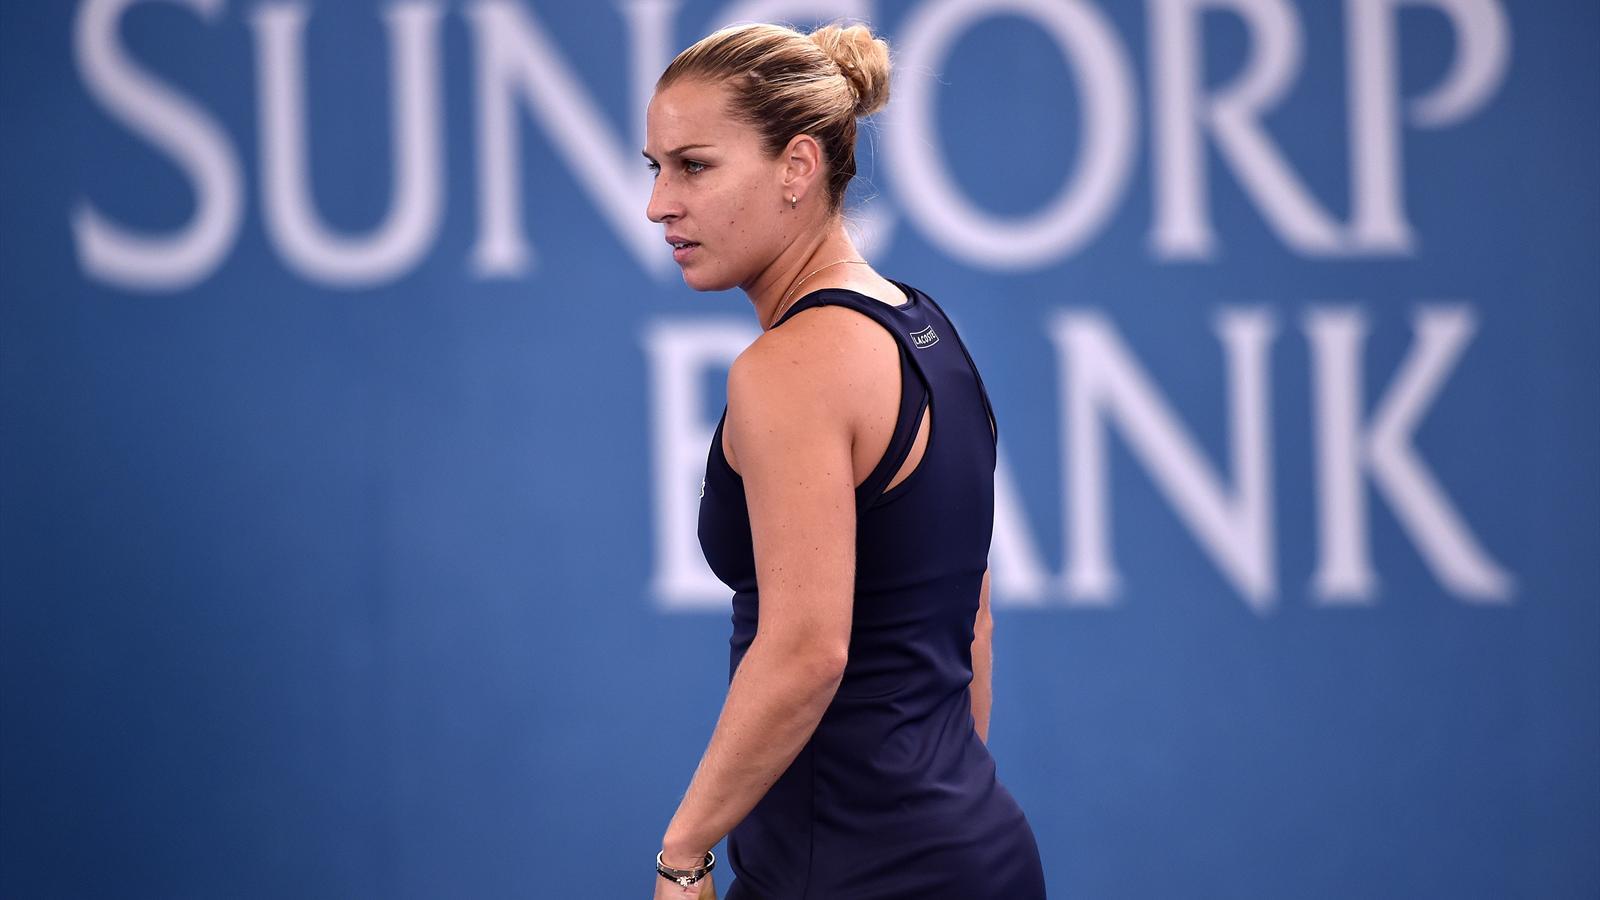 Victoire Finale De Dominika Cibulkova Wta Katowice 2016 Tennis